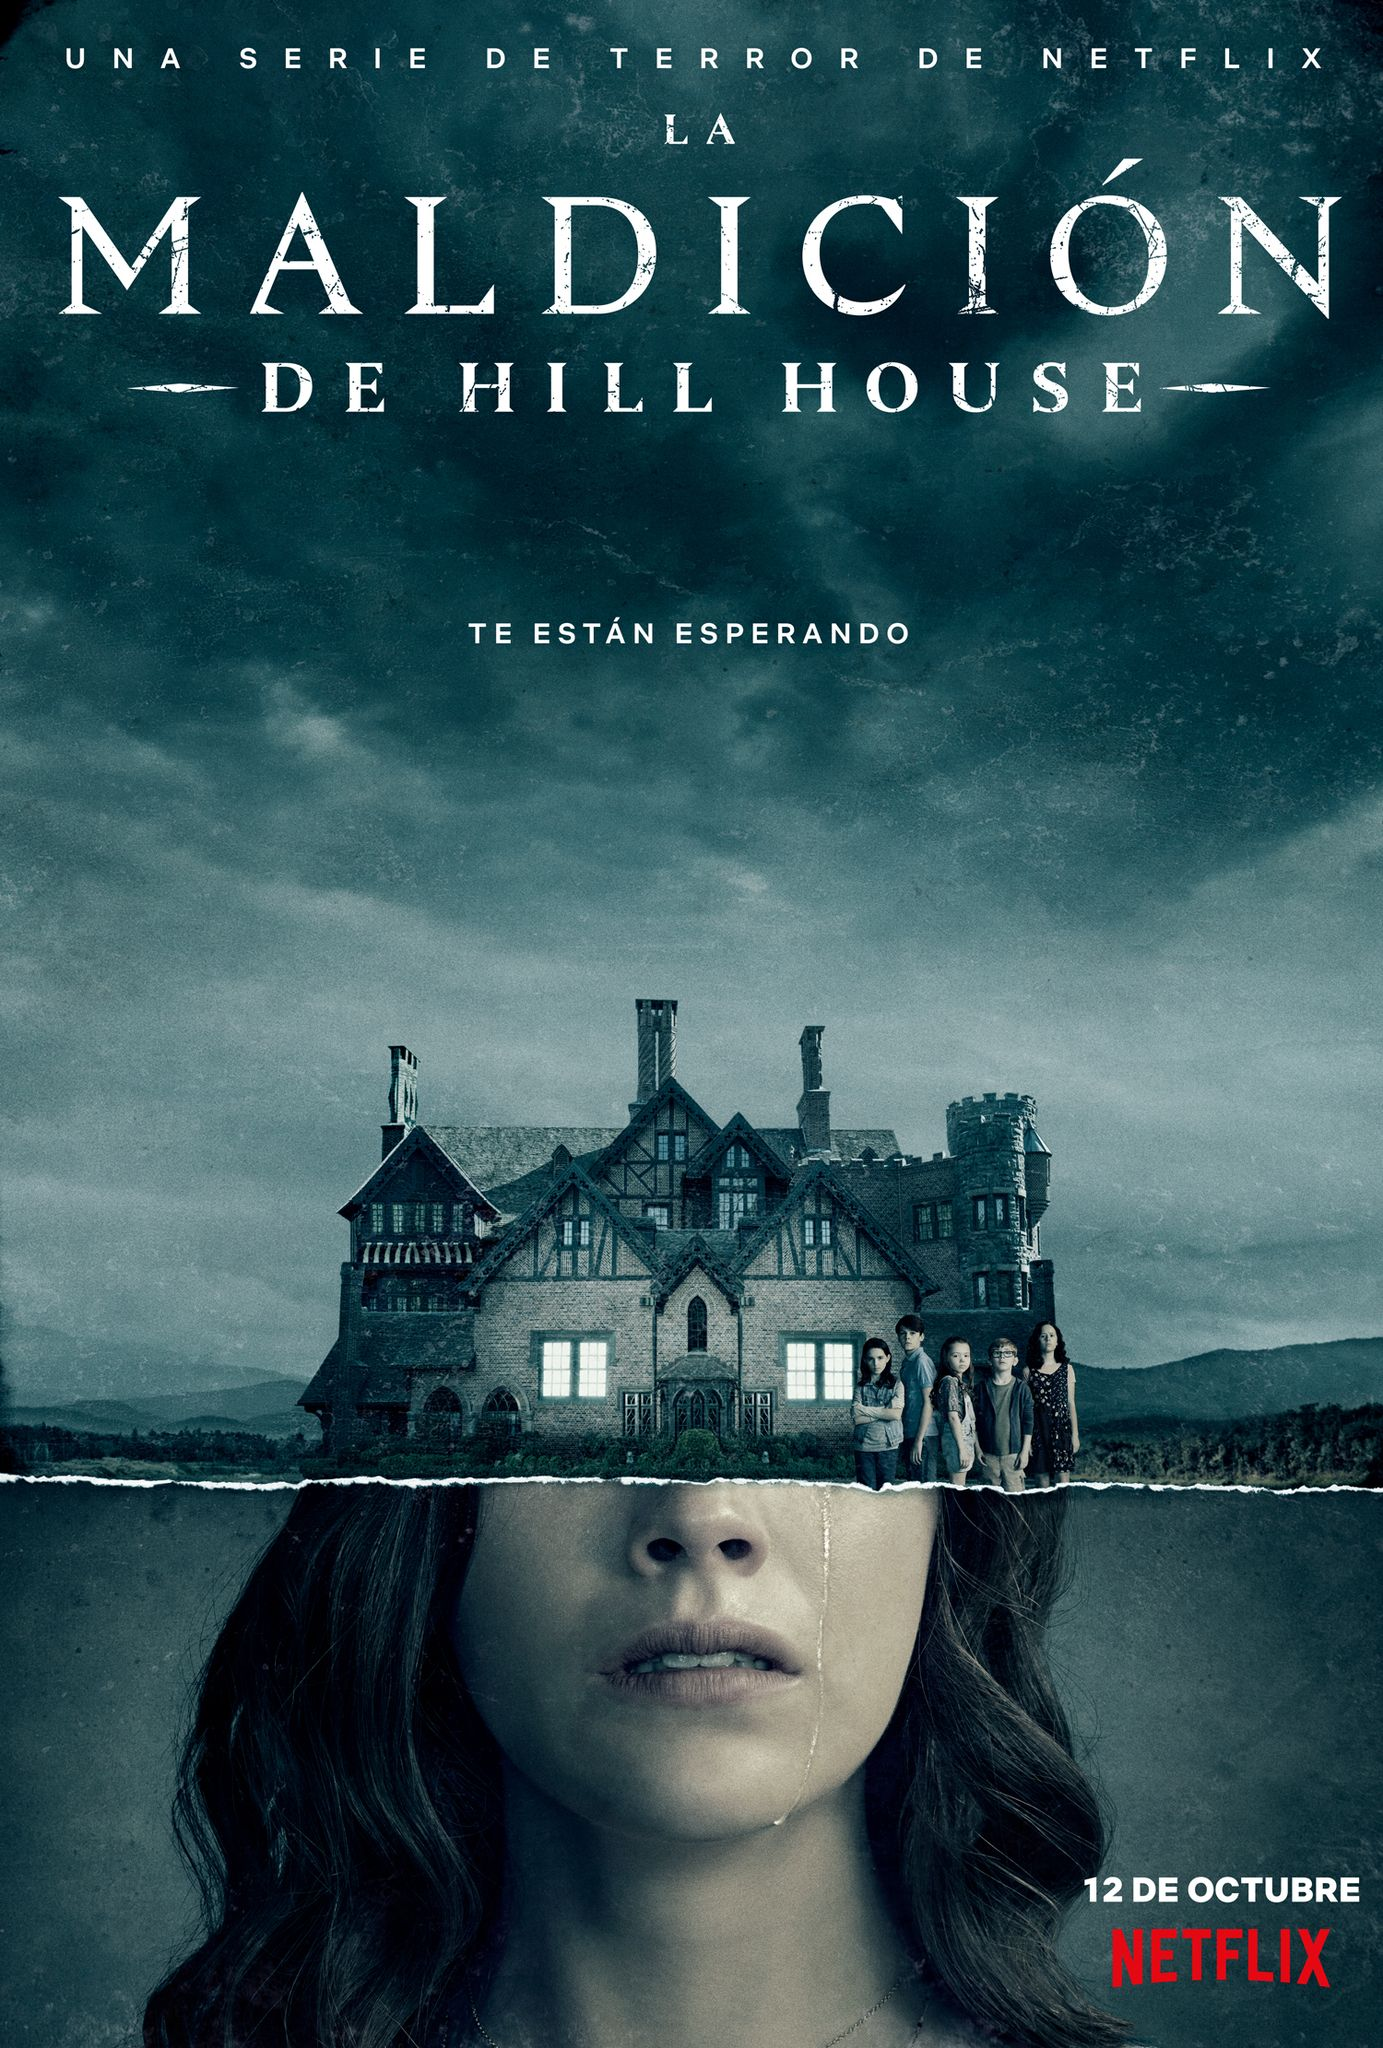 nueva serie de terror de Netflix